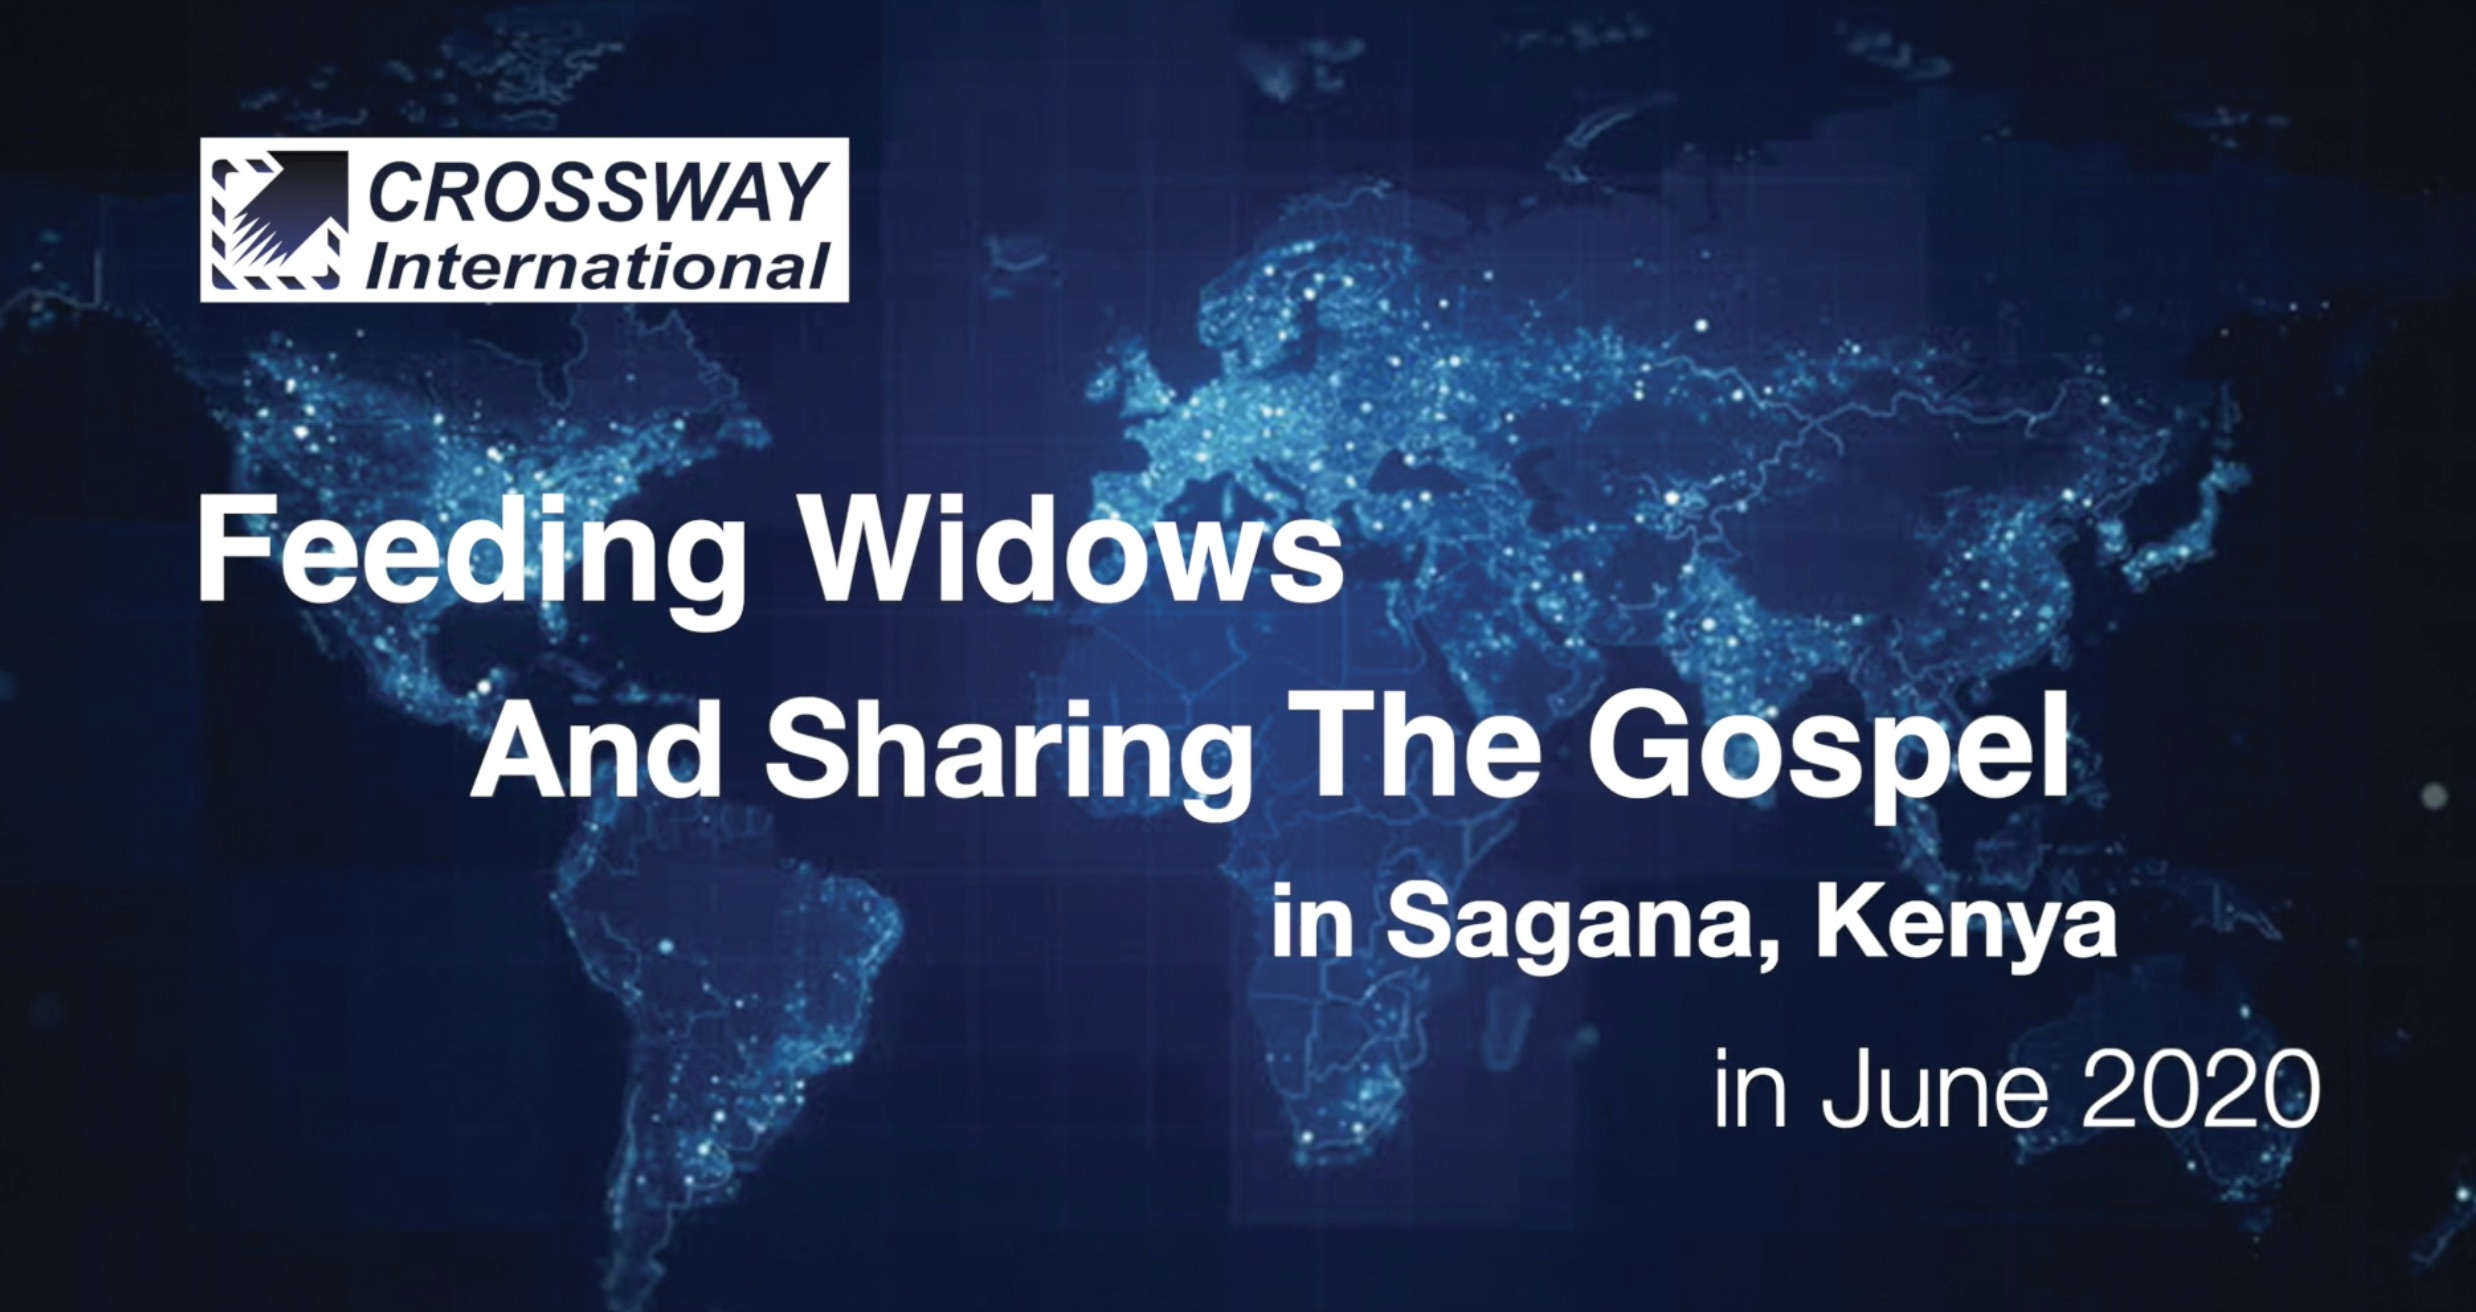 June 2020 Widow Outreach in Sagana Kenya – 1 minute slideshow